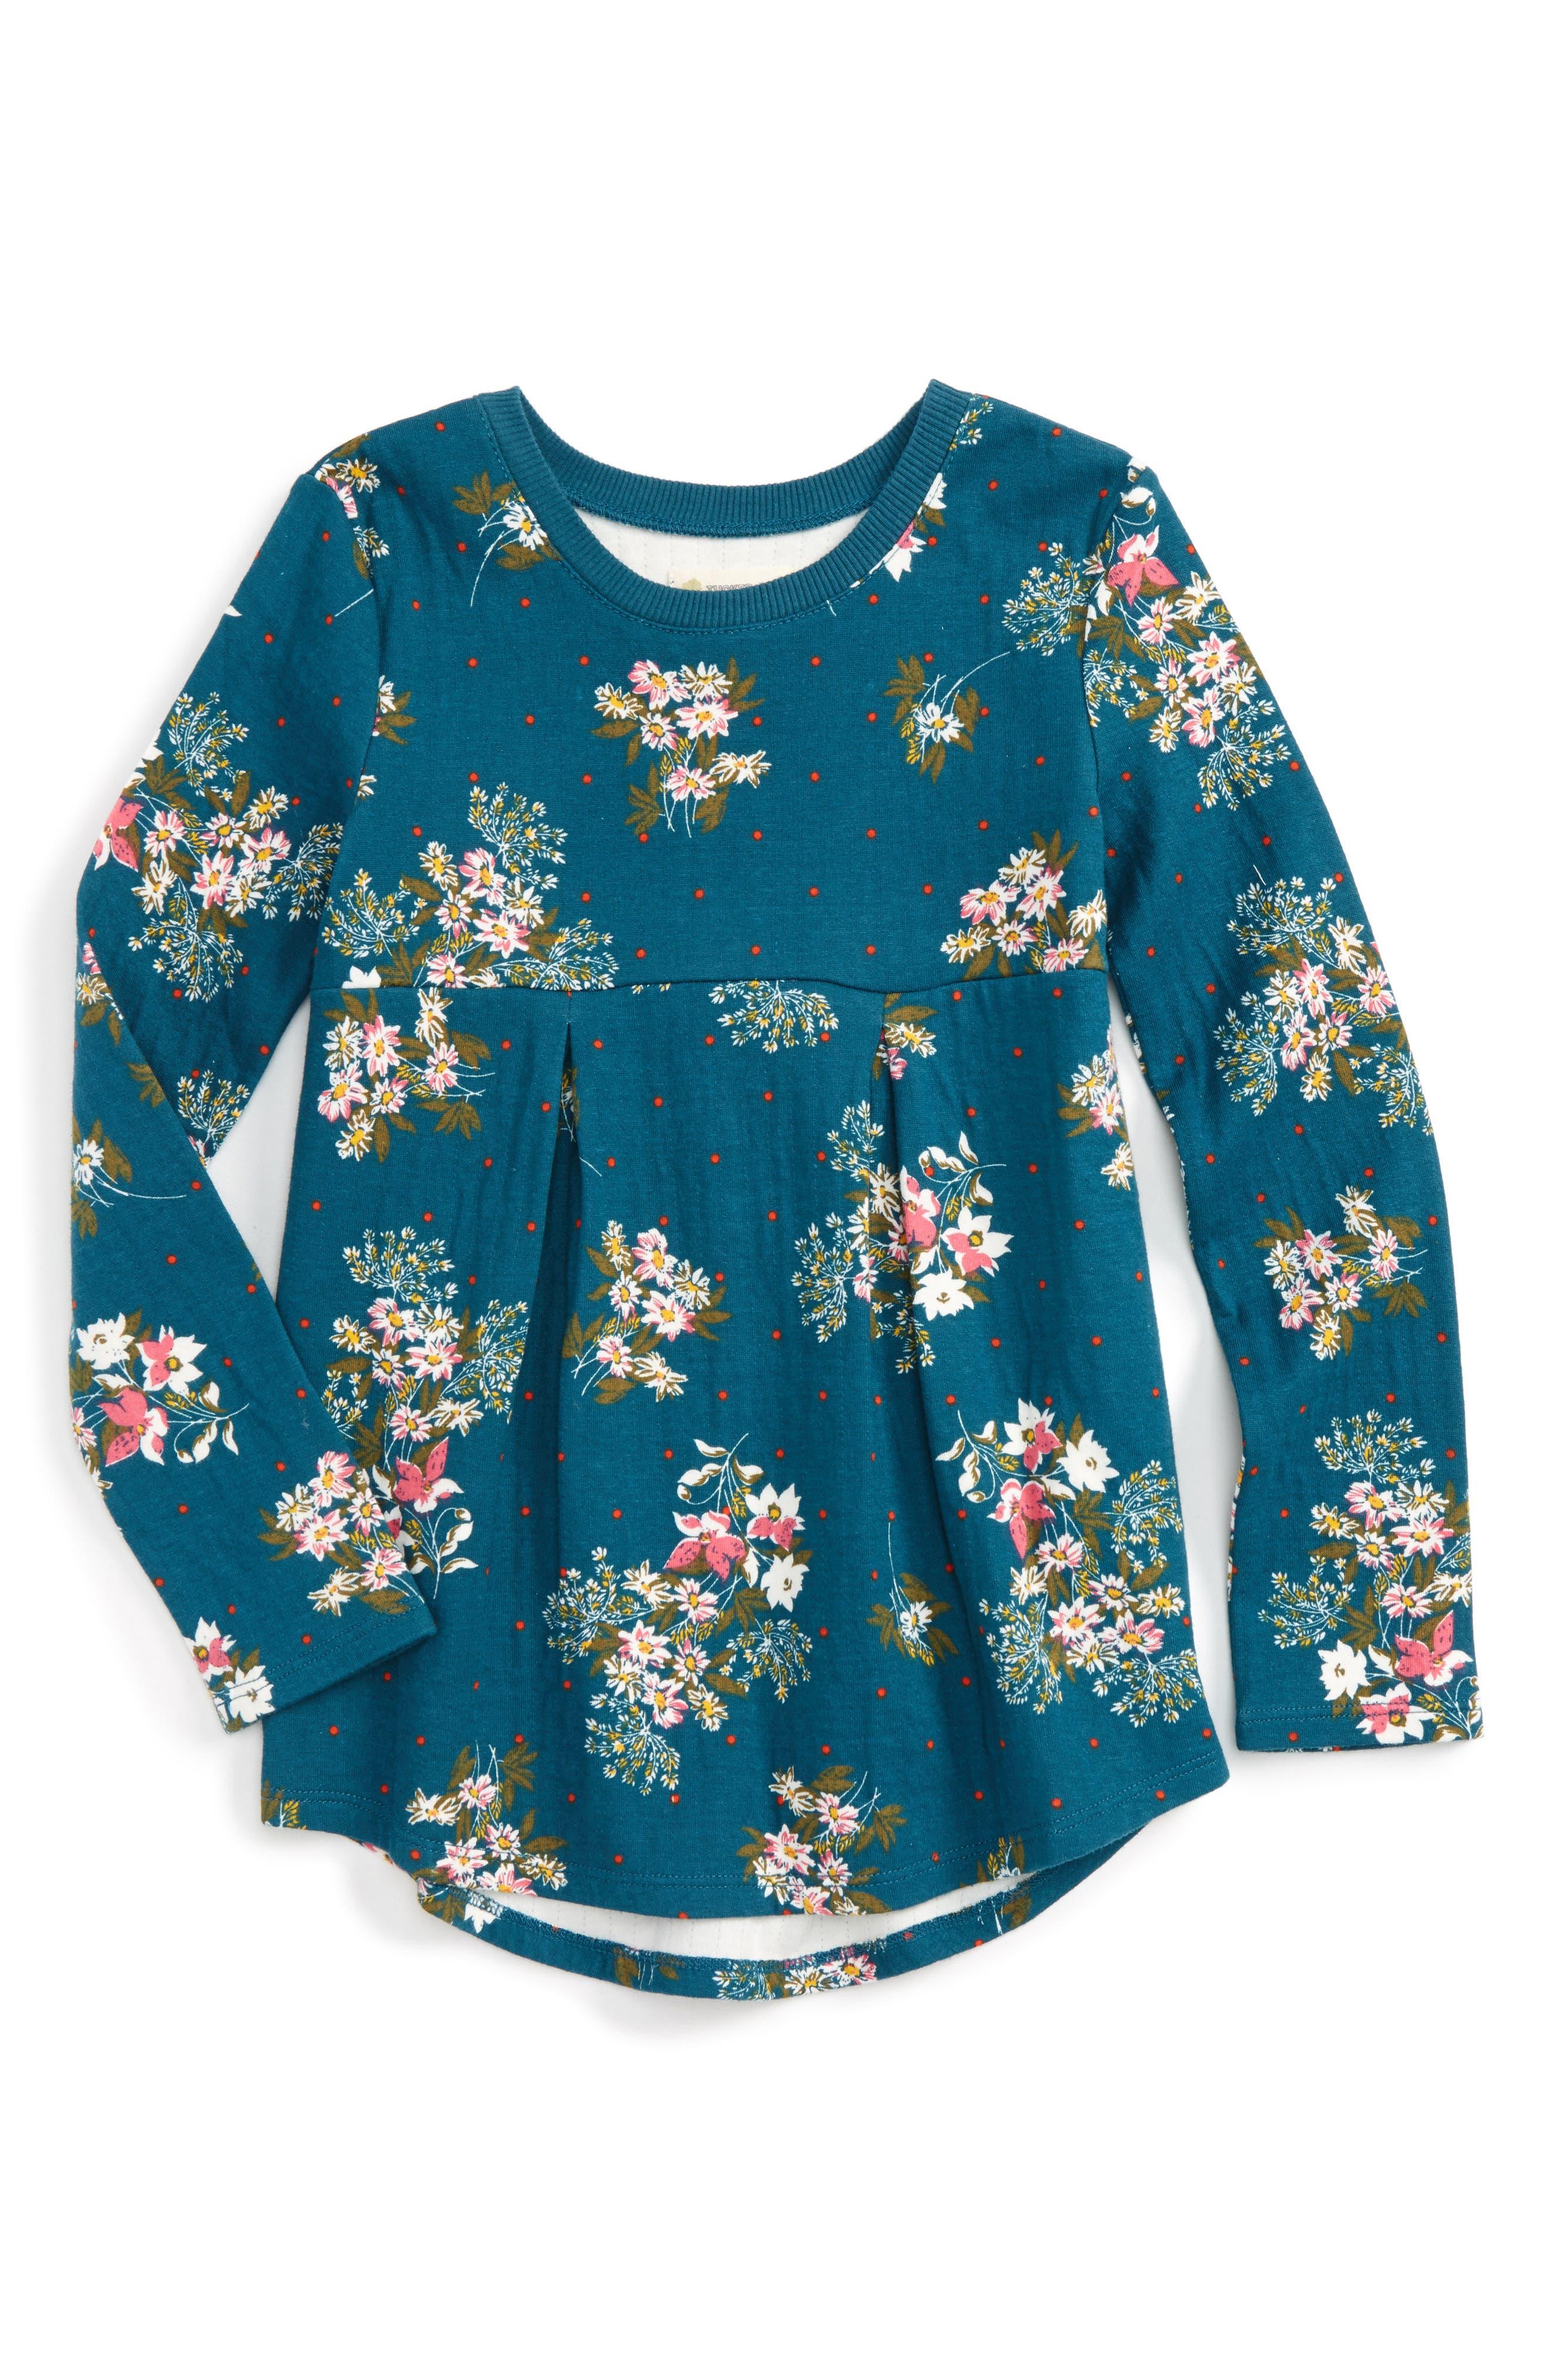 Alternate Image 1 Selected - Tucker + Tate Floral Print Double Knit Tunic (Toddler Girls, Little Girls & Big Girls)